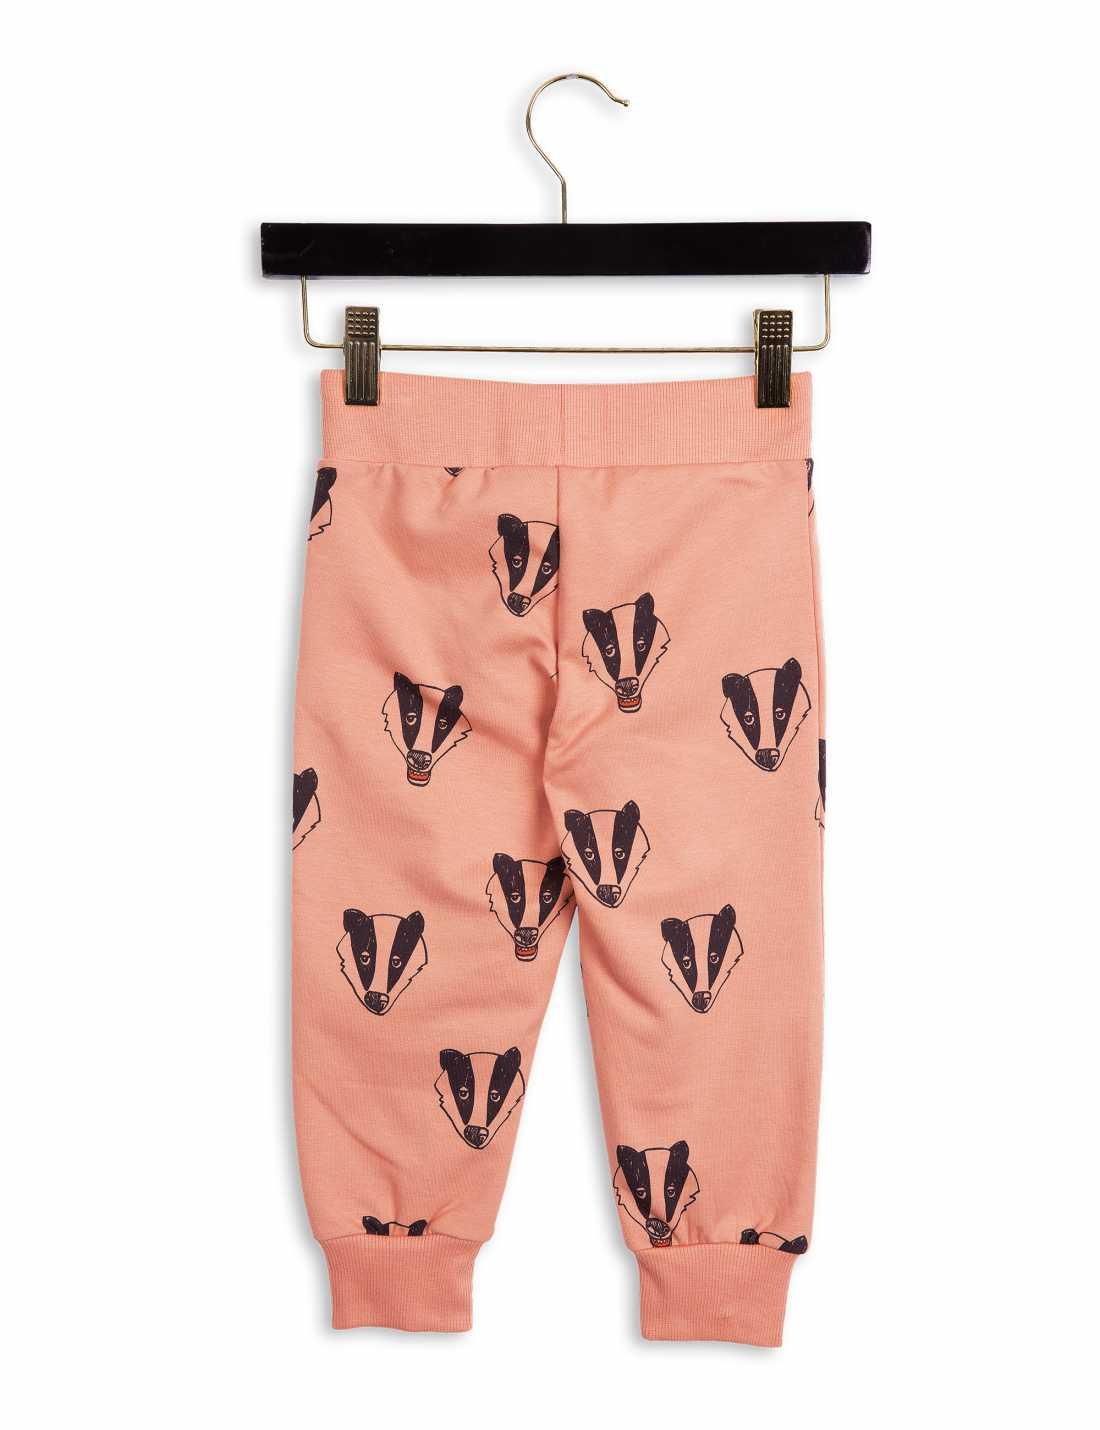 Badger Sweatpants